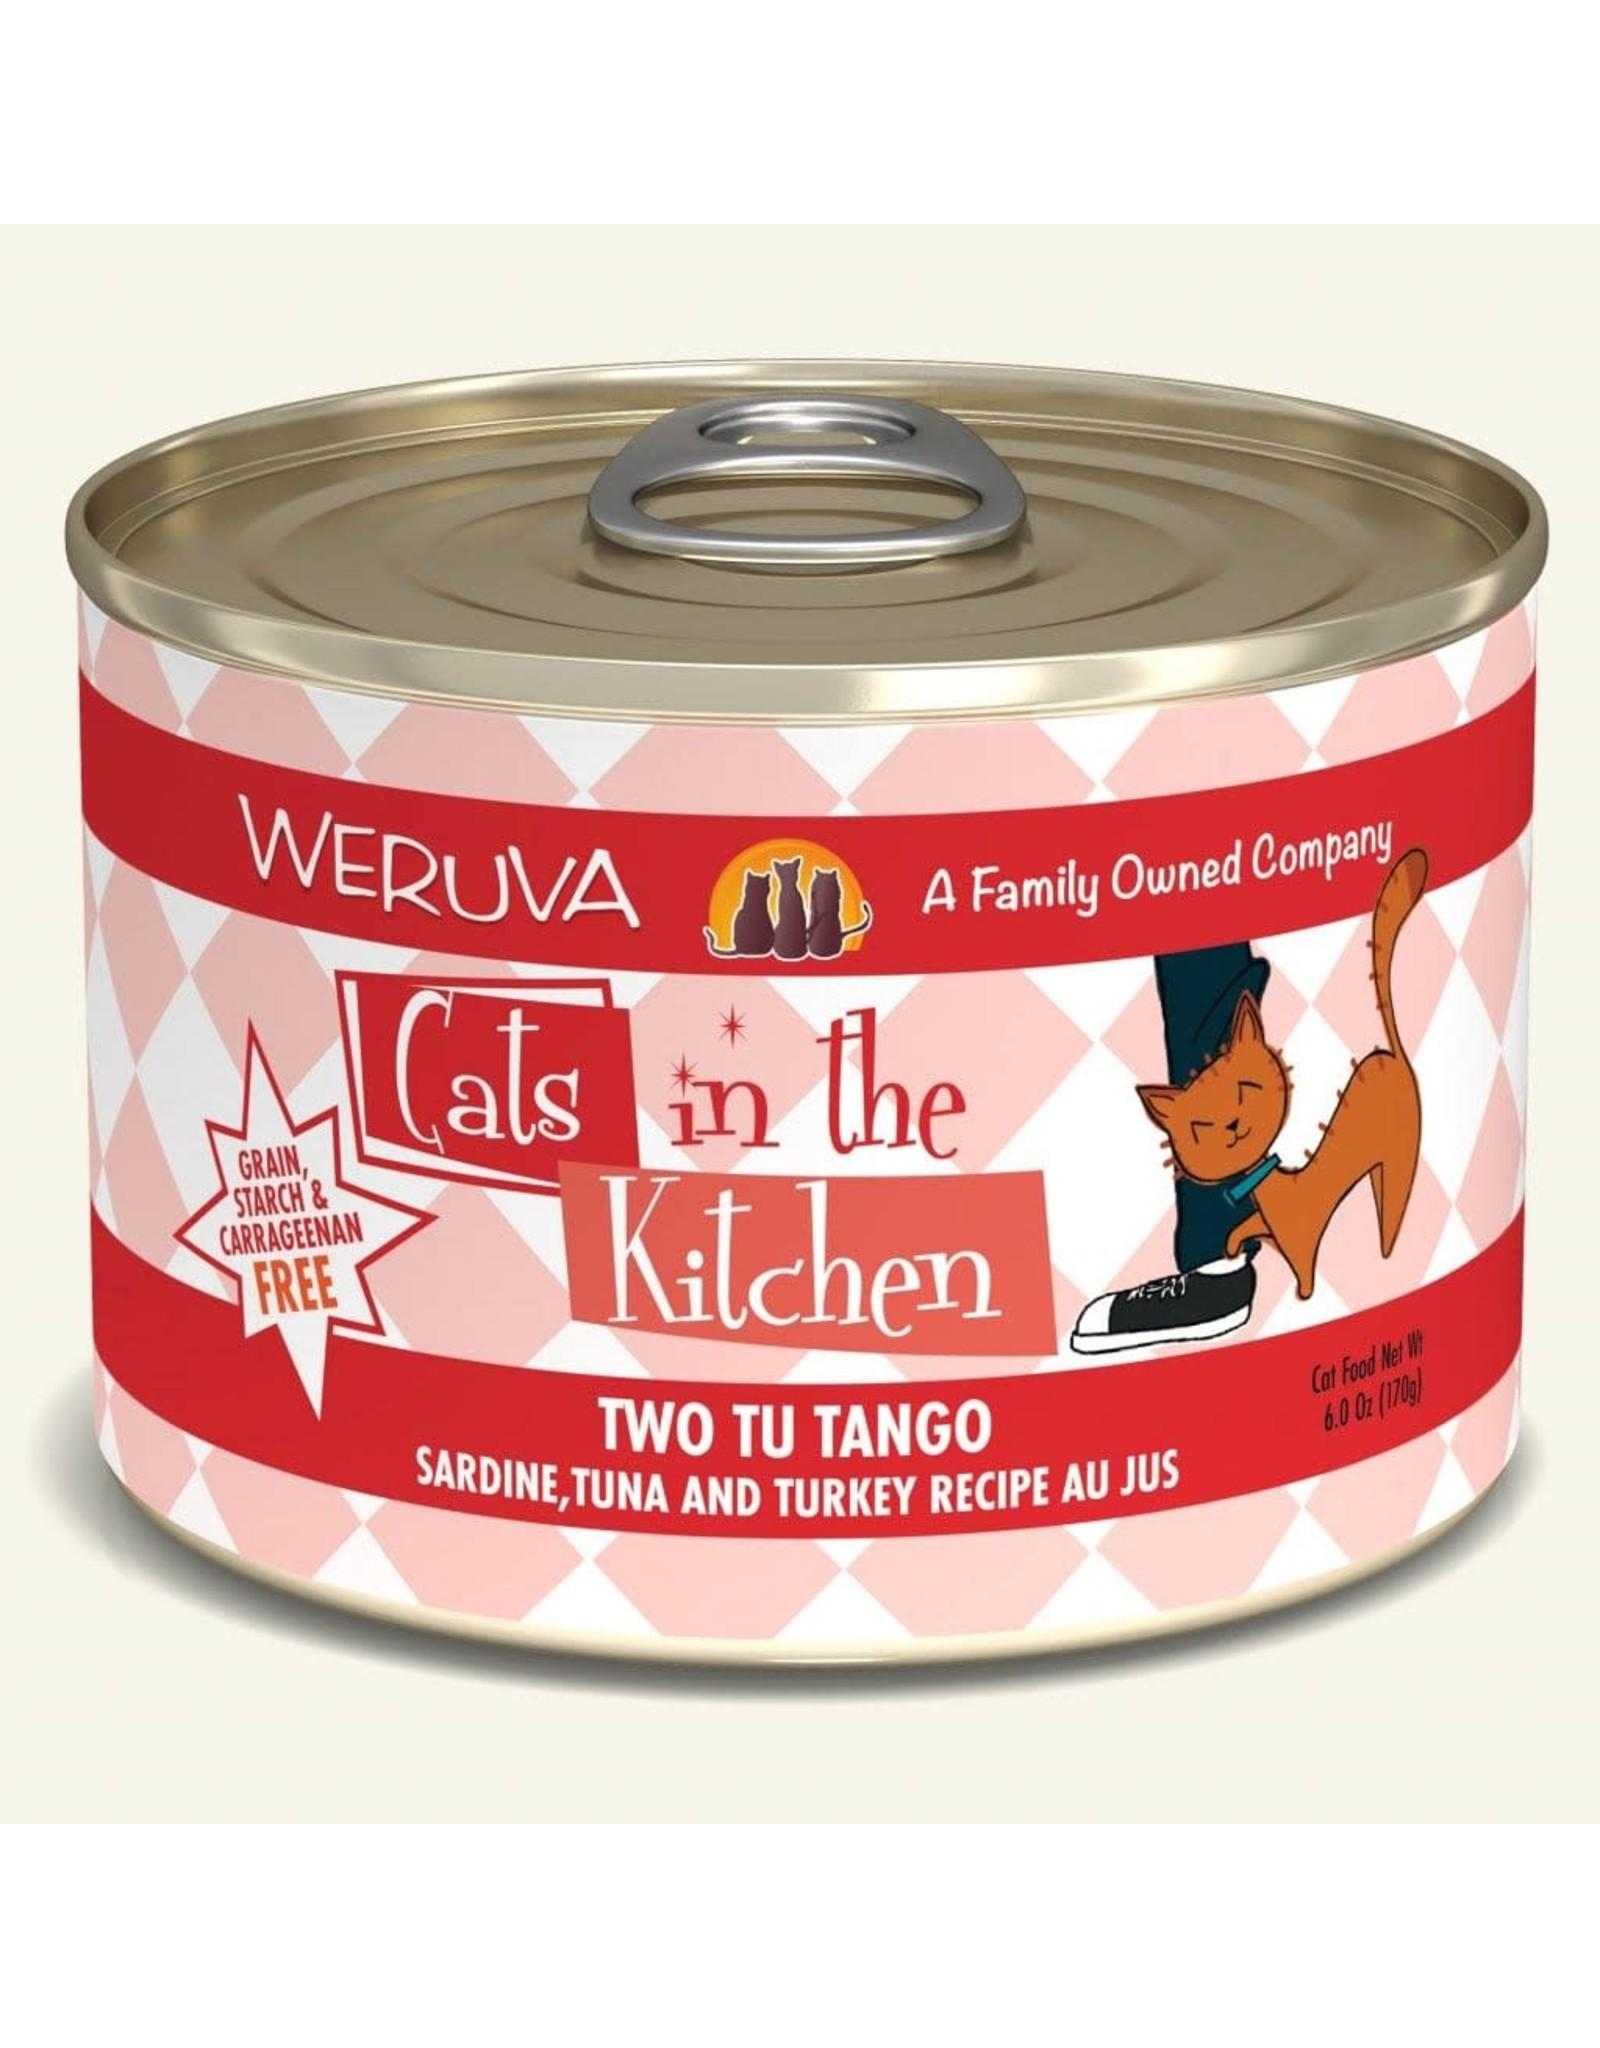 Weruva Weruva Cats in the Kitchen Two Tu Tango 6oz